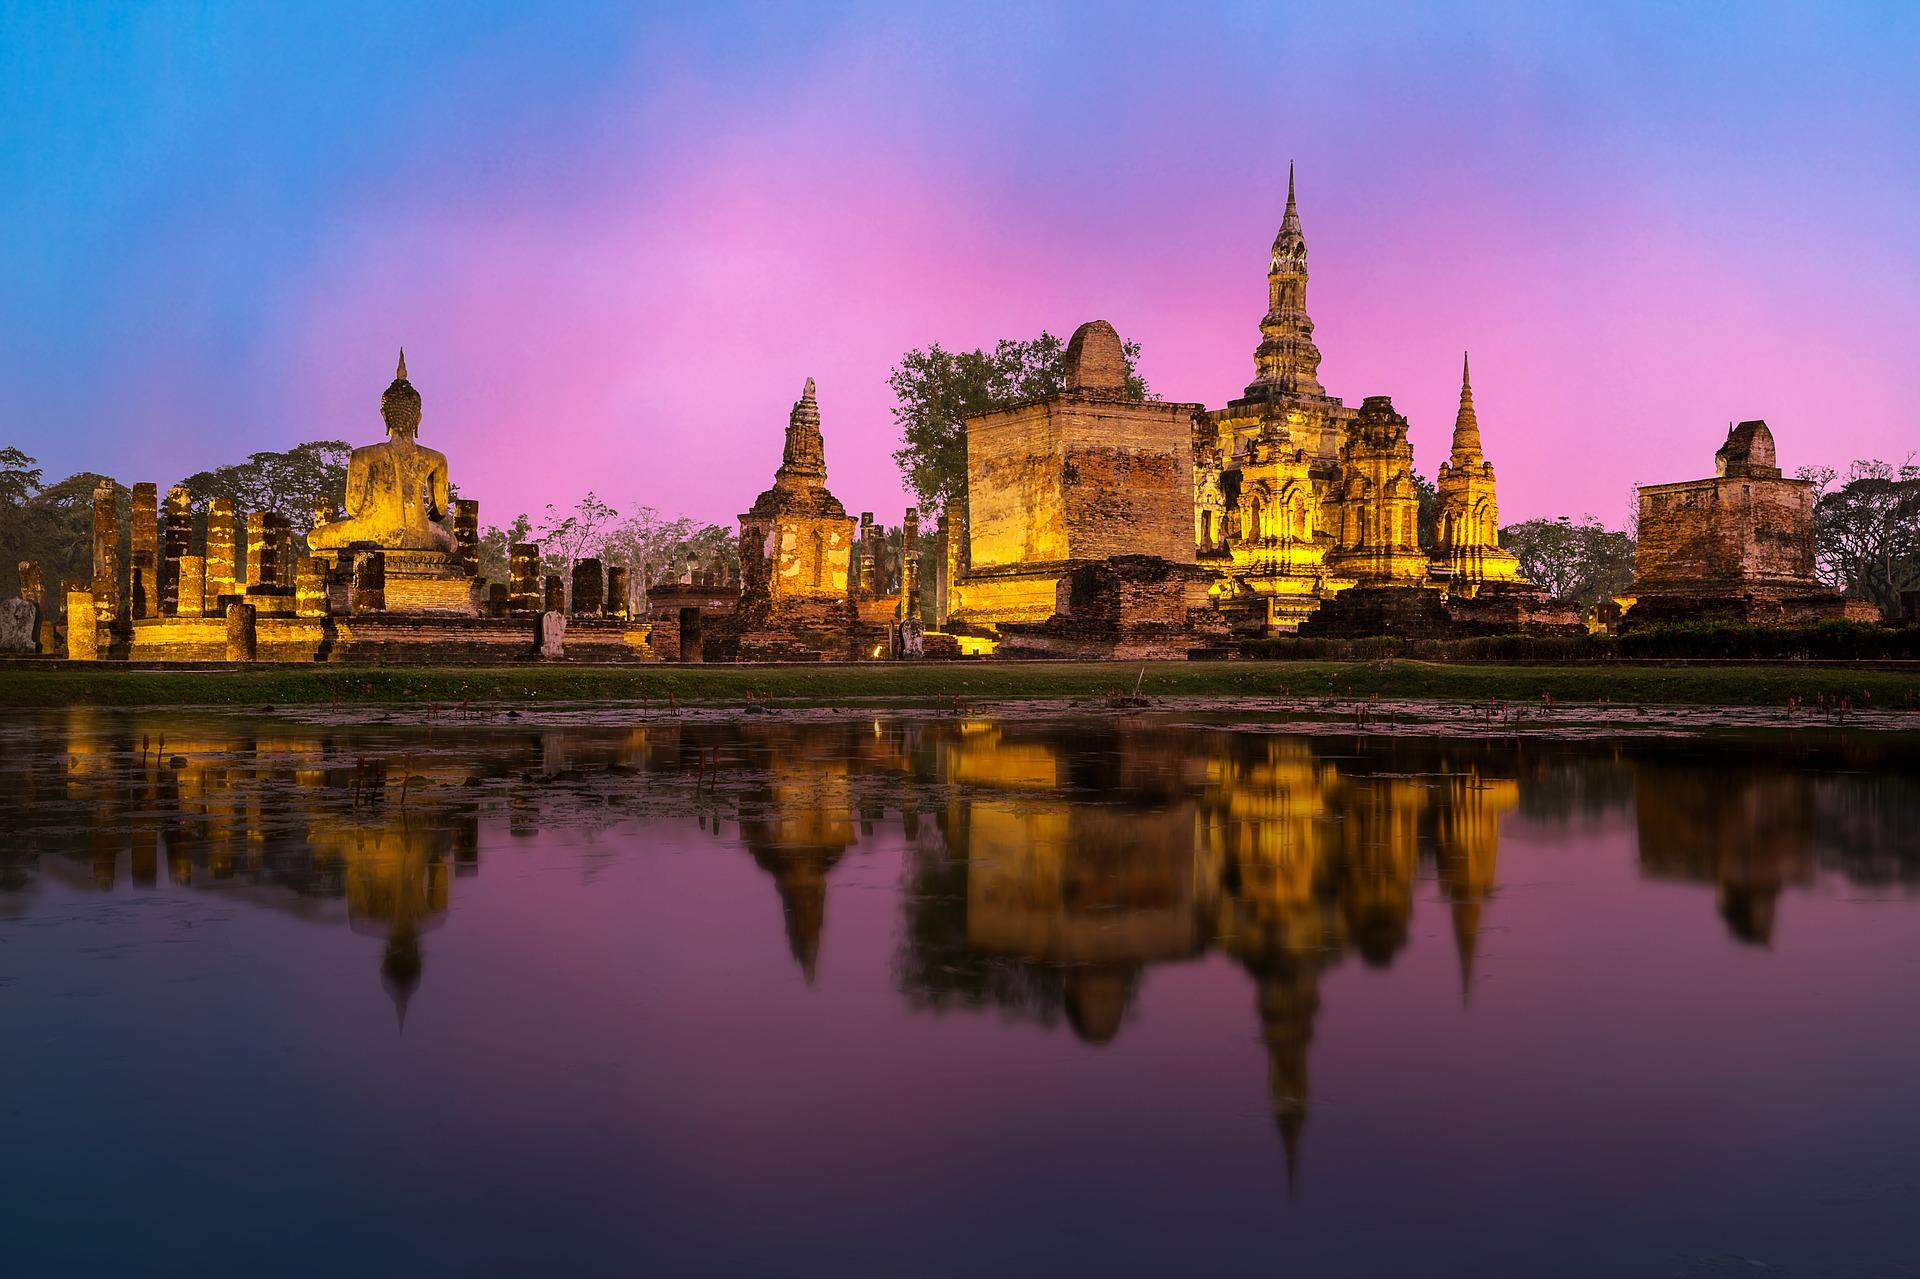 Phra nakhon si ayutthaya photo